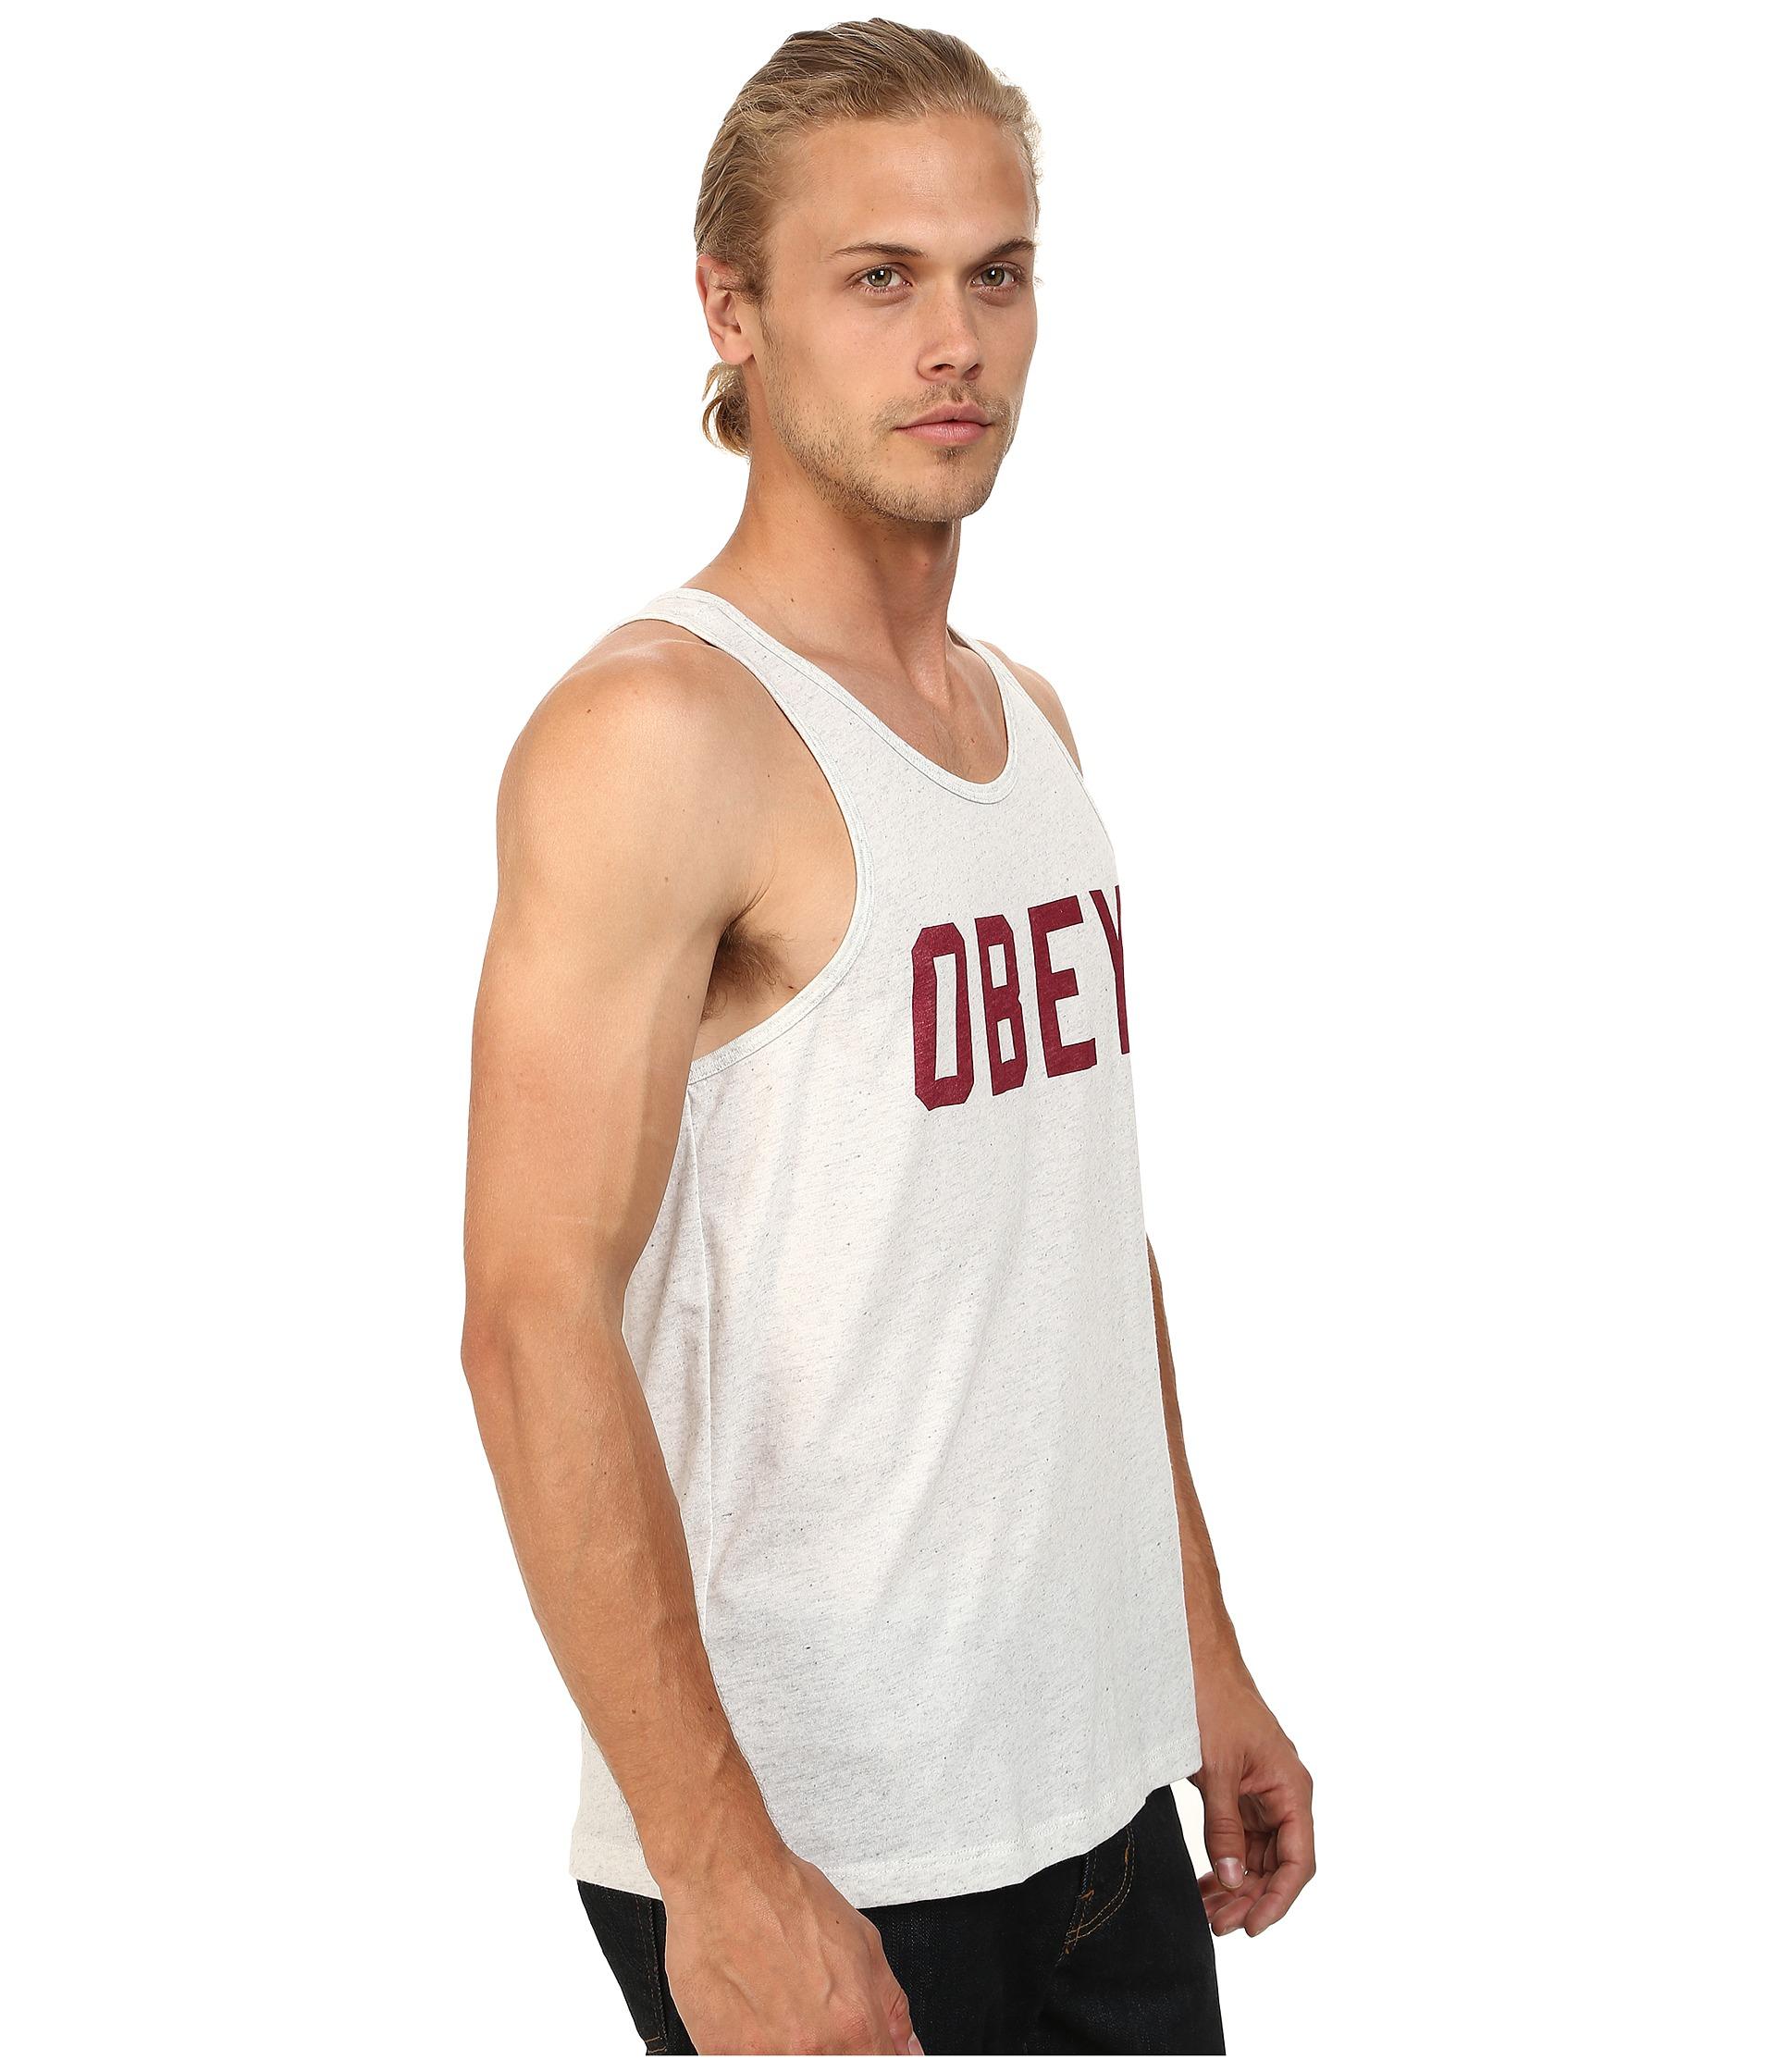 obey collegiate triblend tank top in gray for men heather. Black Bedroom Furniture Sets. Home Design Ideas